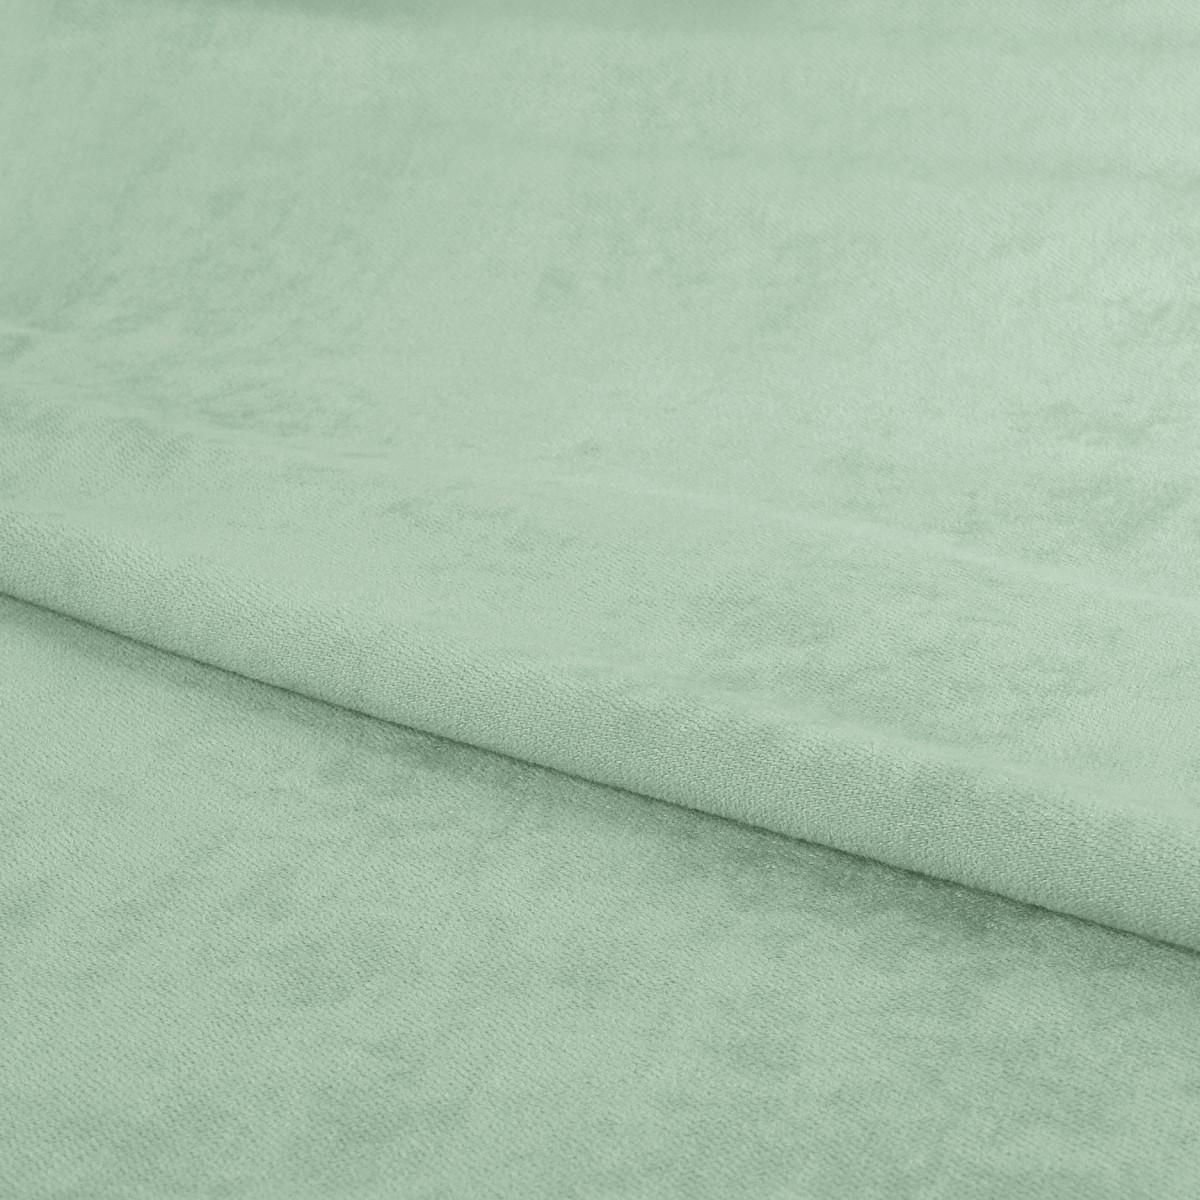 Ткань 1 м/п канвас 100 см цвет зеленый